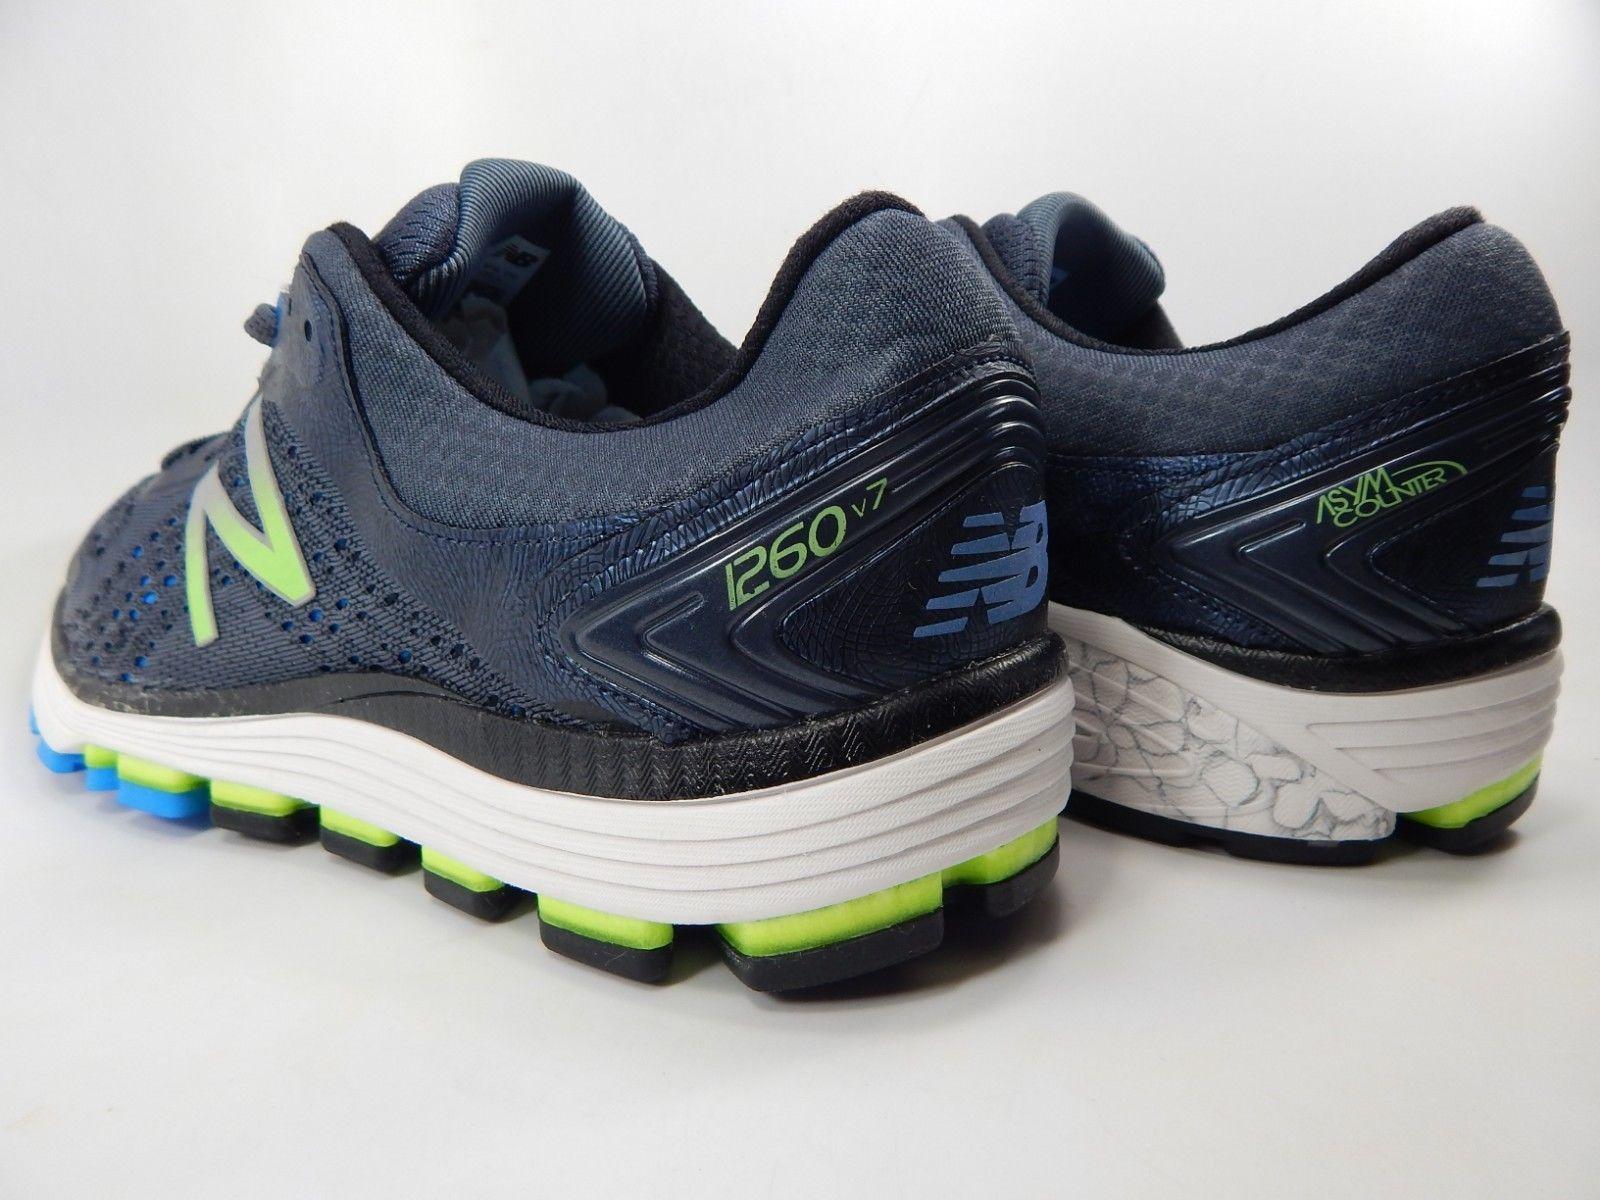 New Balance 1260 v7 Size 10.5 M D EU 44.5 Men's Running Shoes Blue M1260BB7